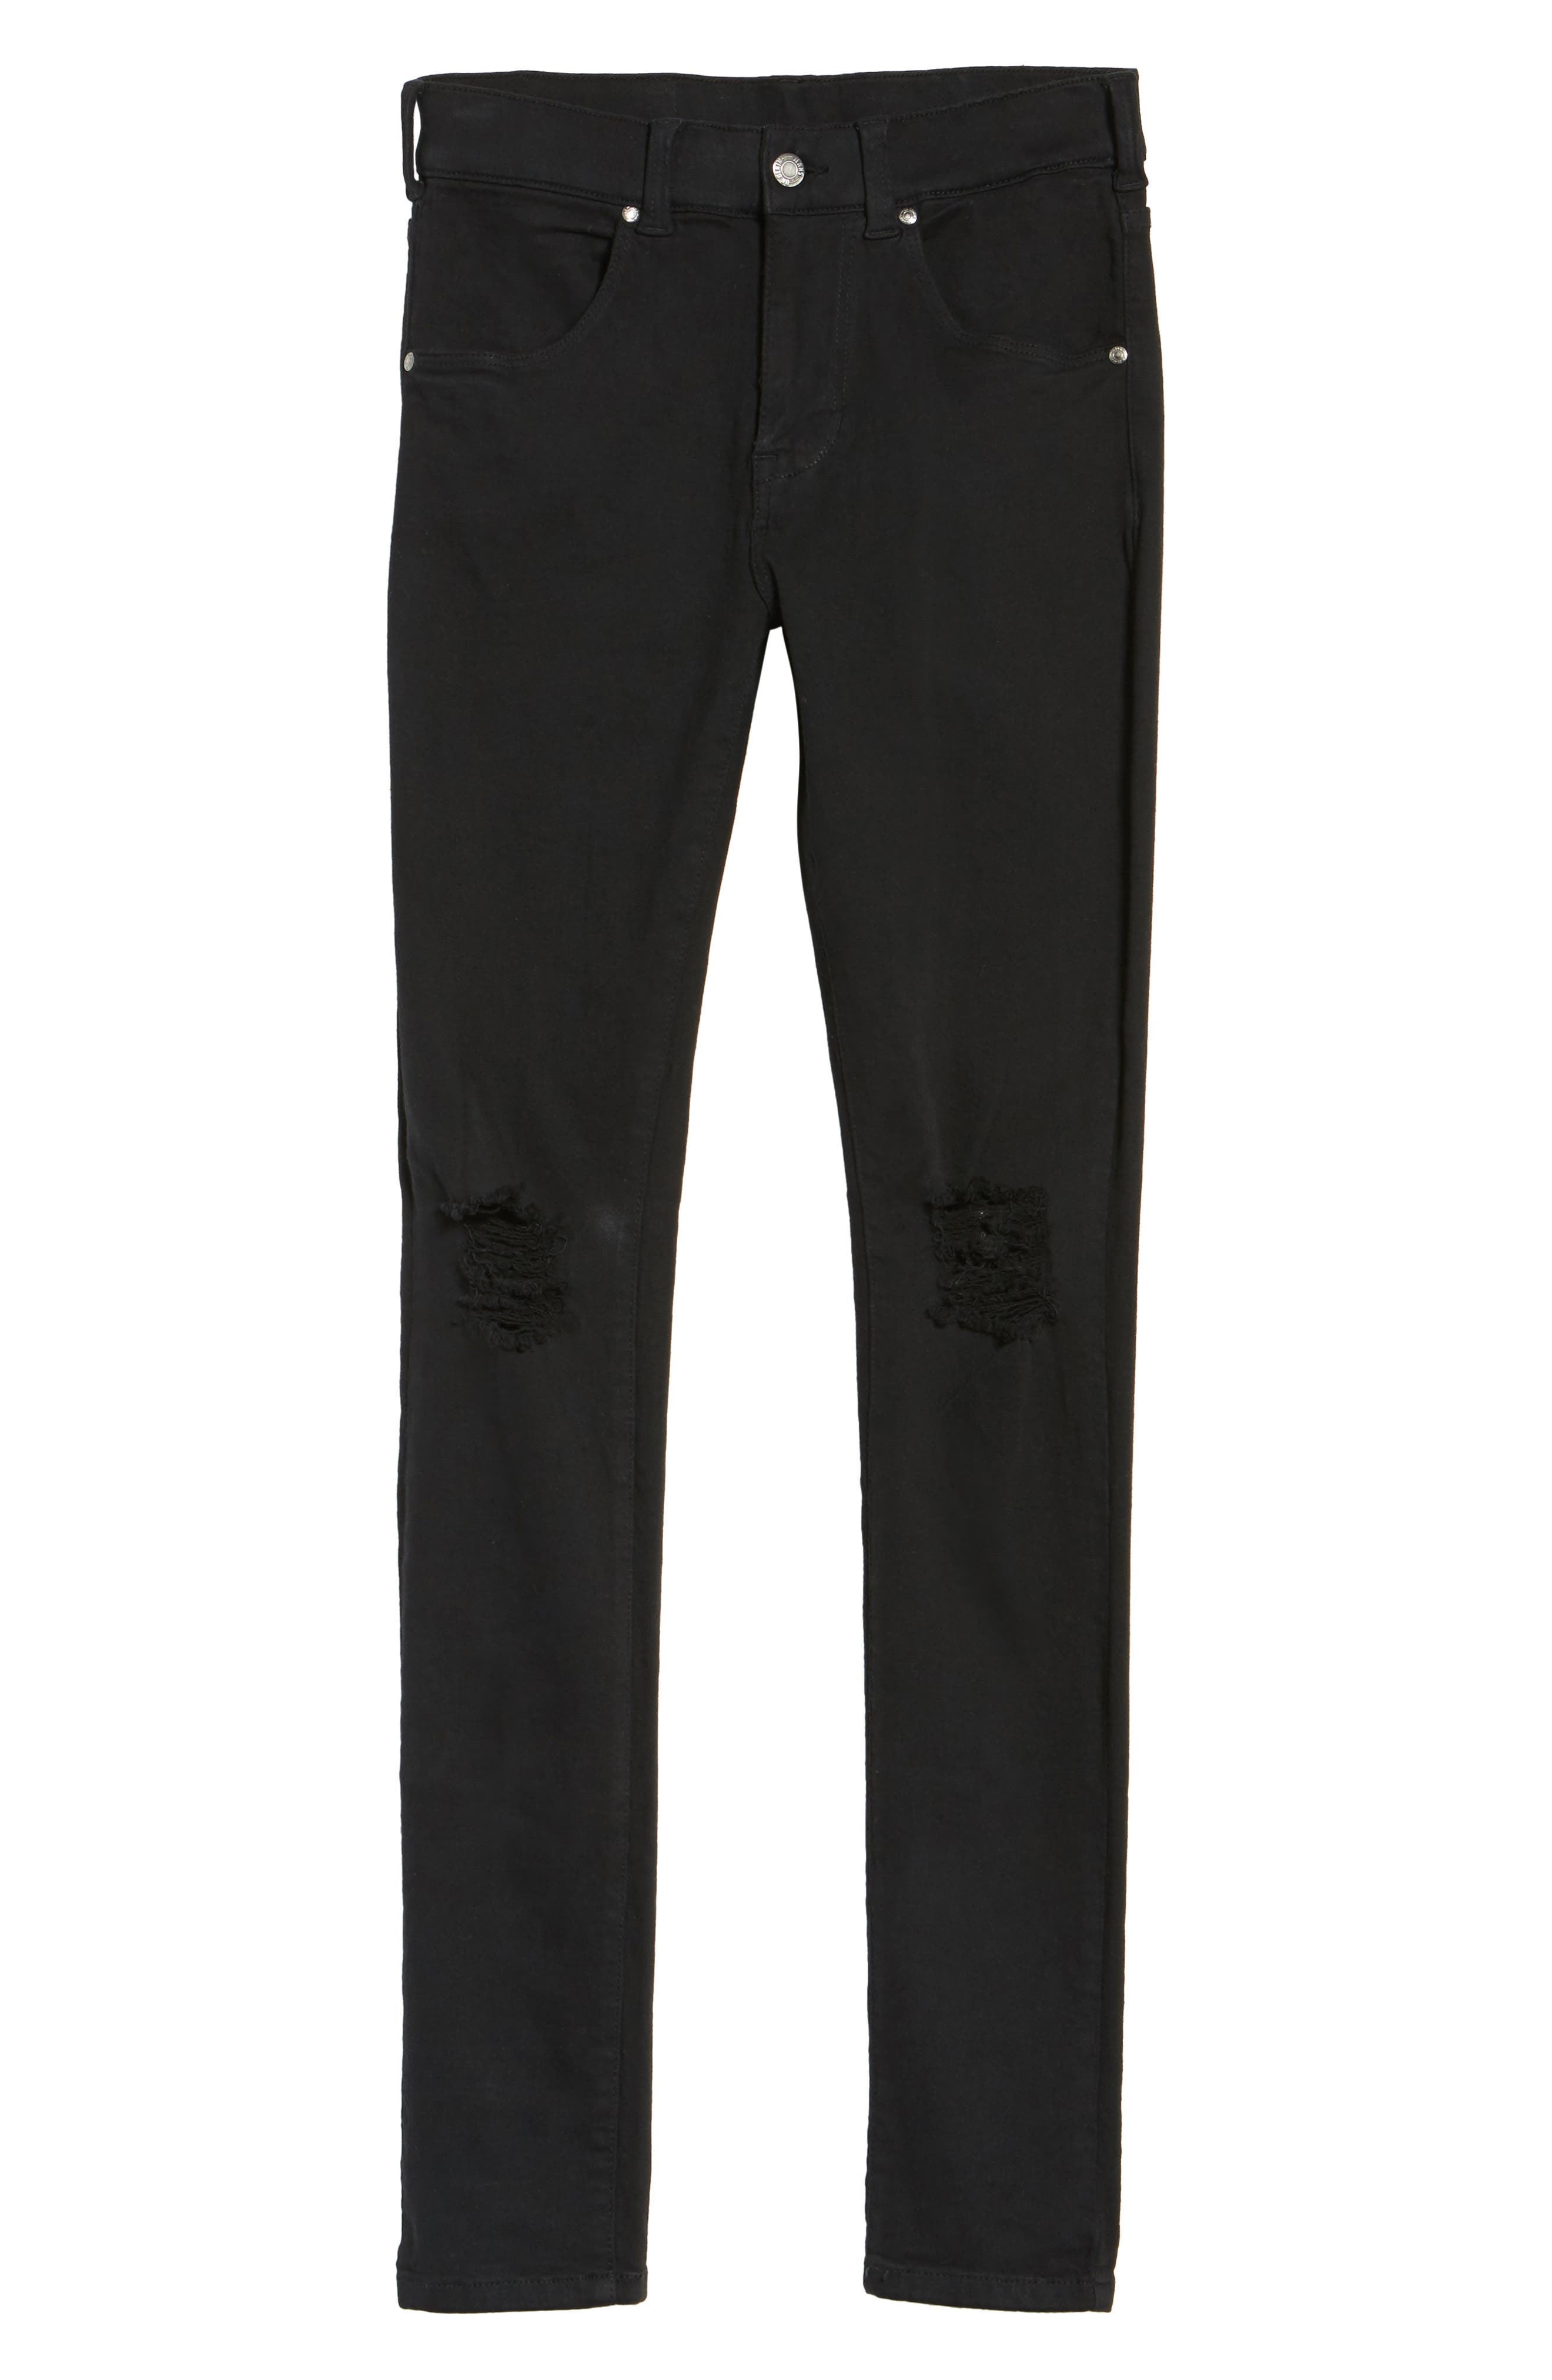 Leroy Slim Fit Jeans,                             Alternate thumbnail 6, color,                             Black Ripped Knees